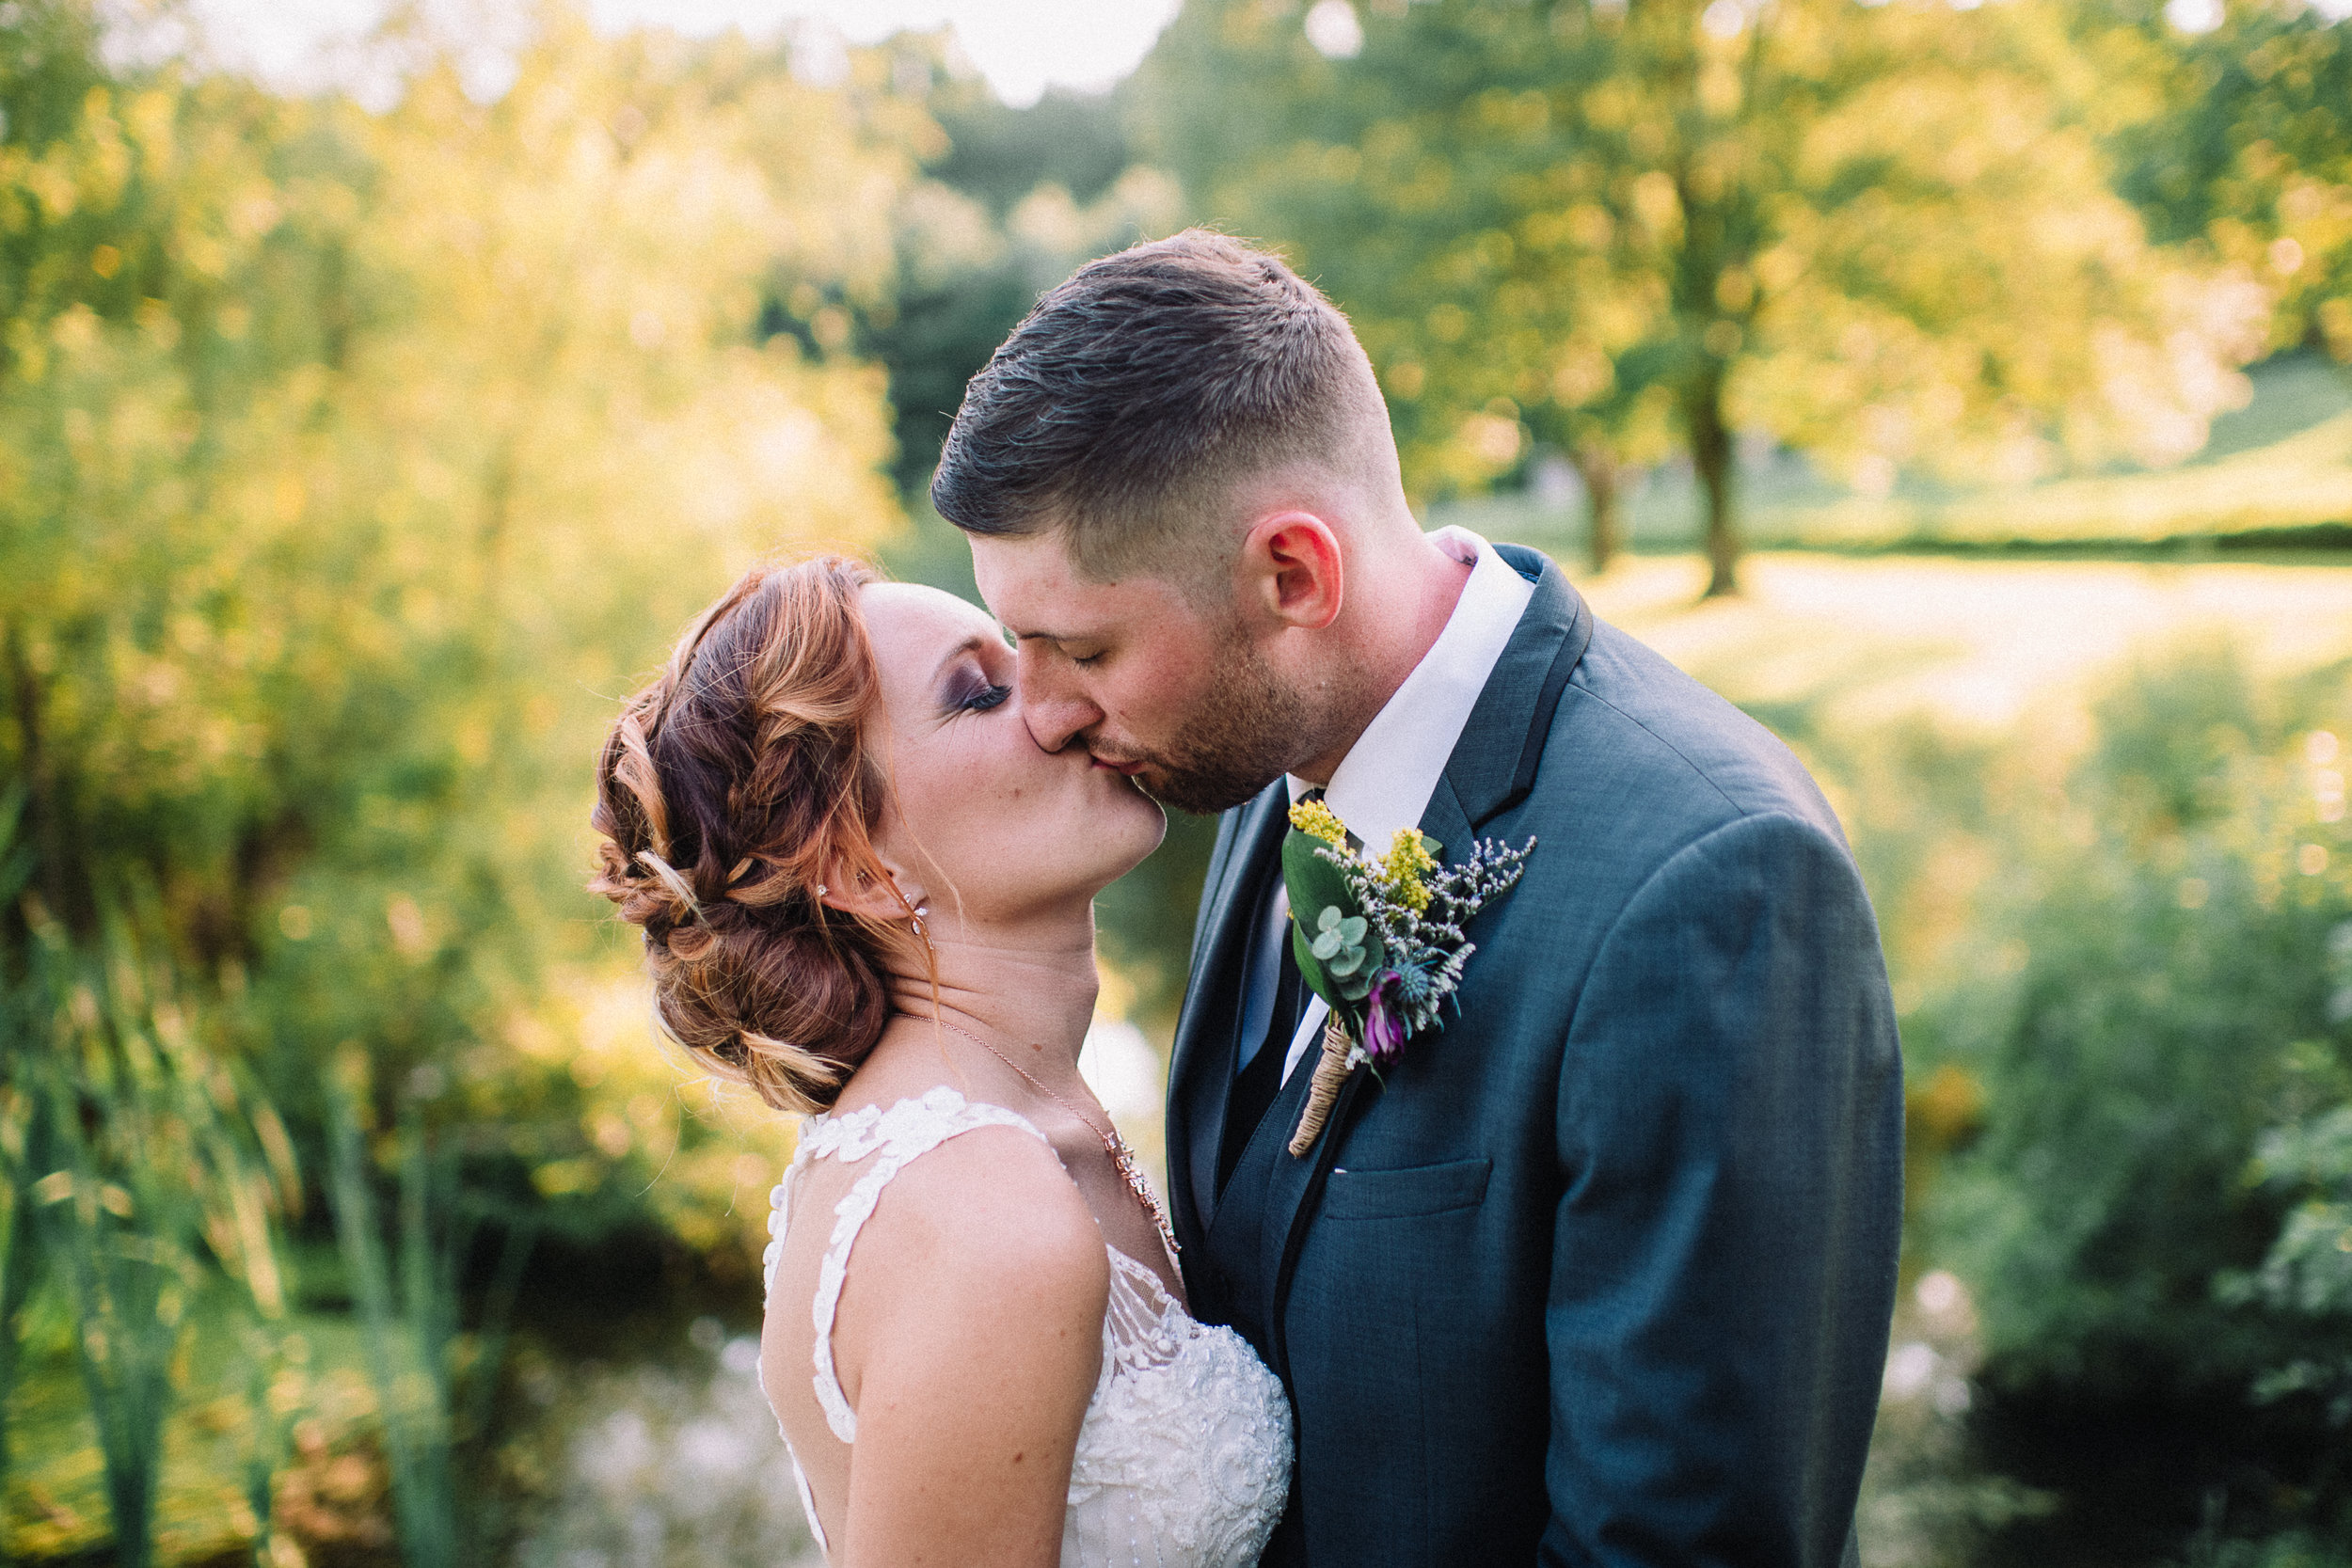 081ninalilyphoto-groveatkemptonwedding-hicksblog.jpg